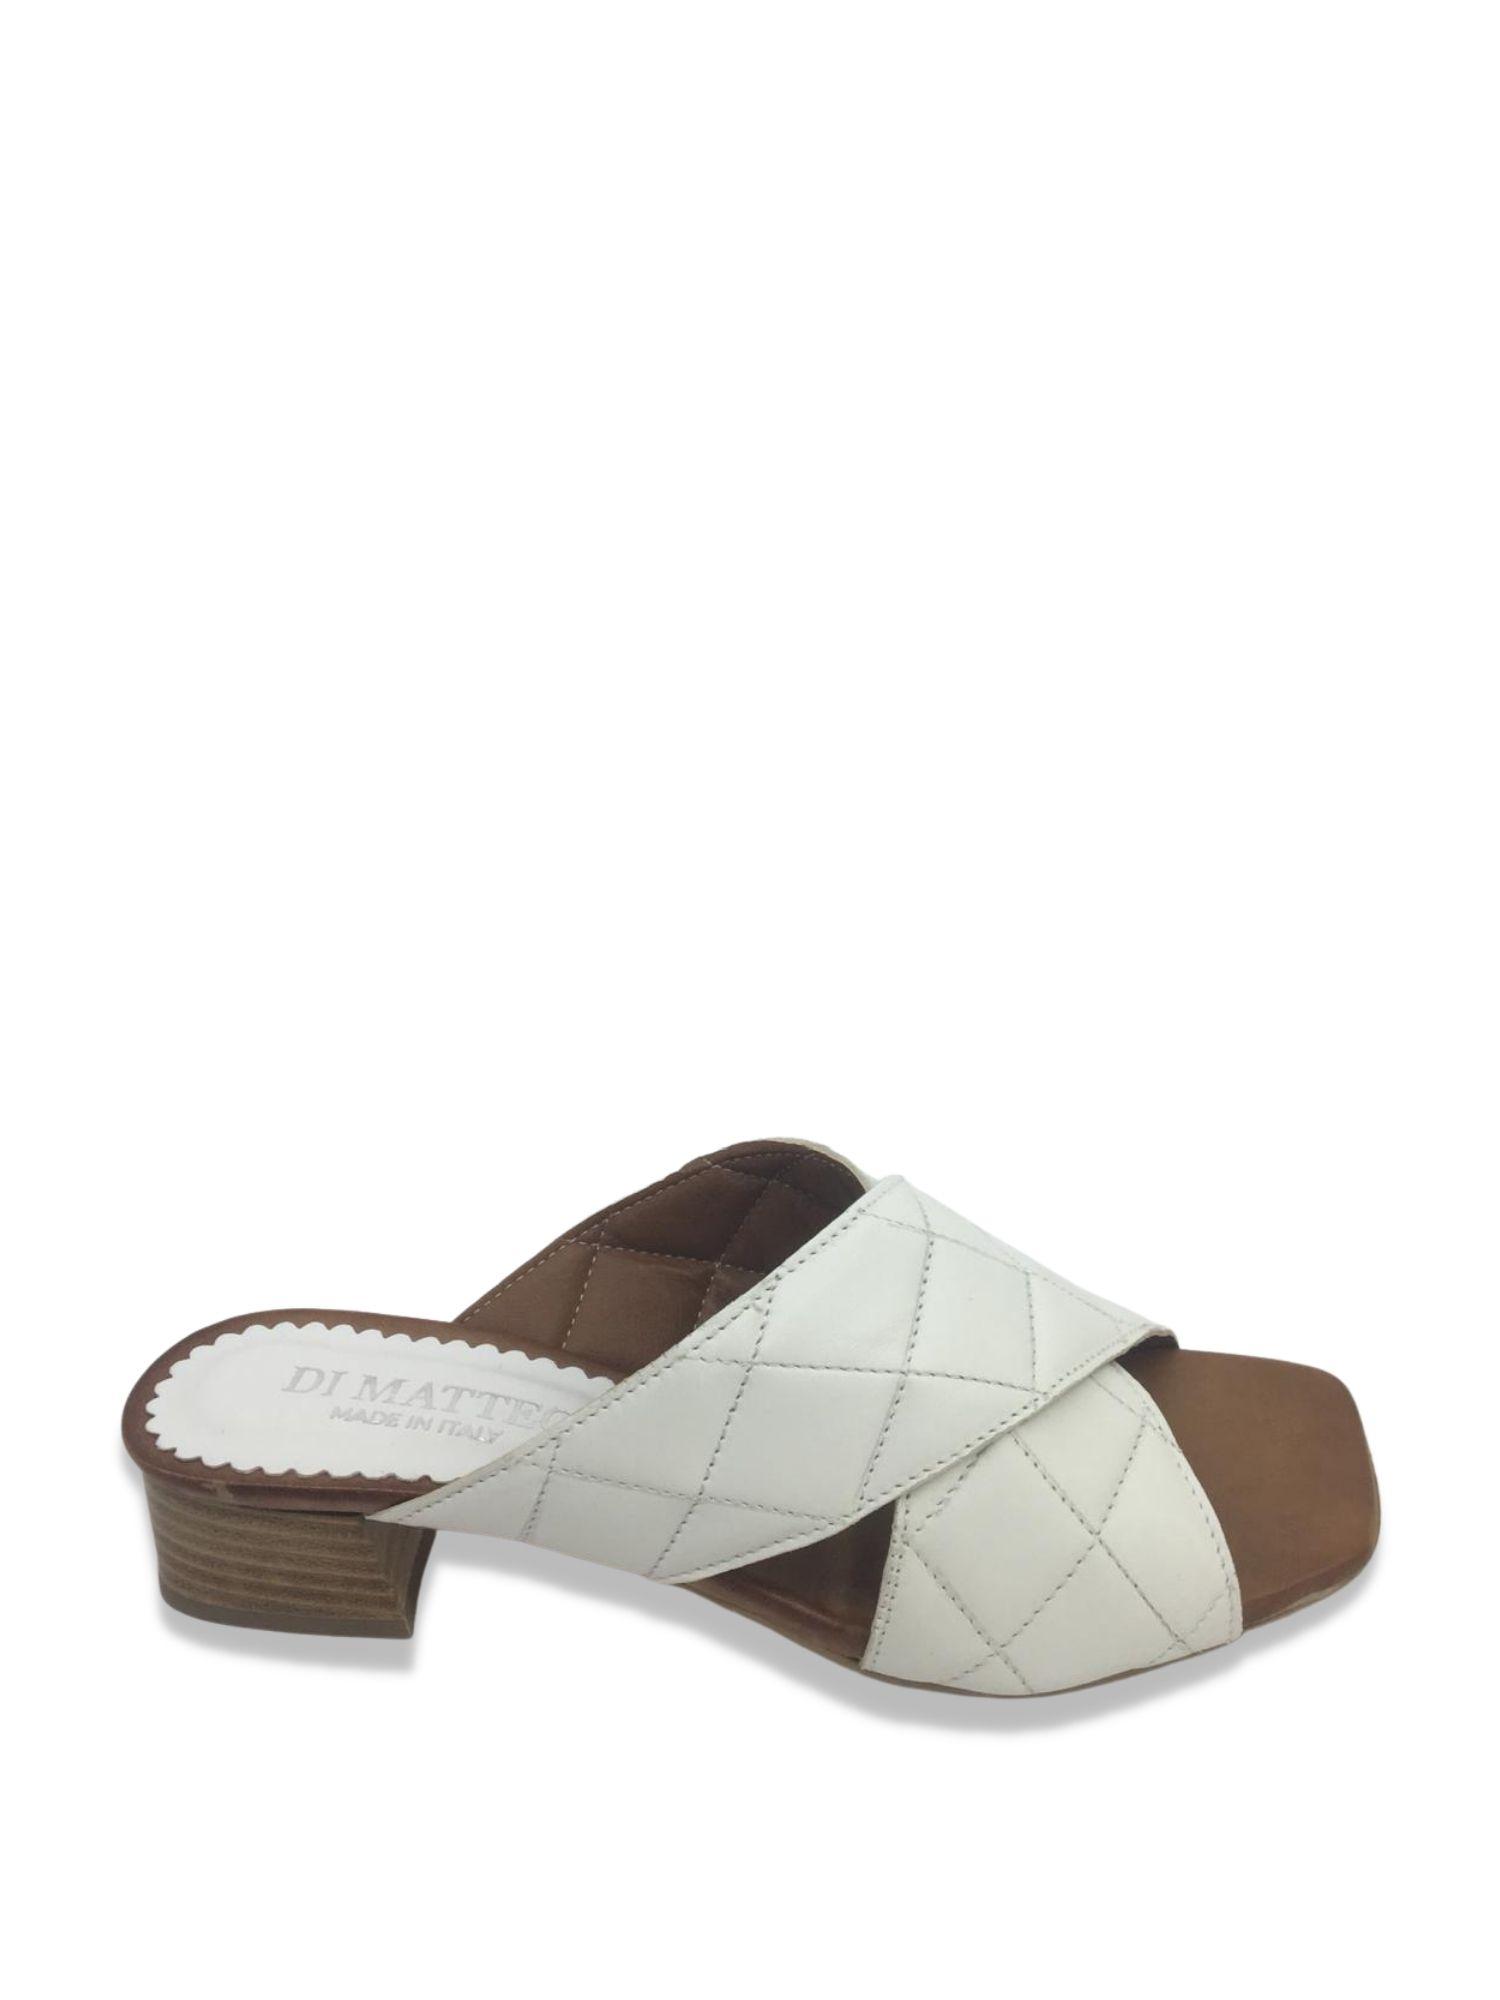 Sandalo scalzato Made in Italy 506 Bianco